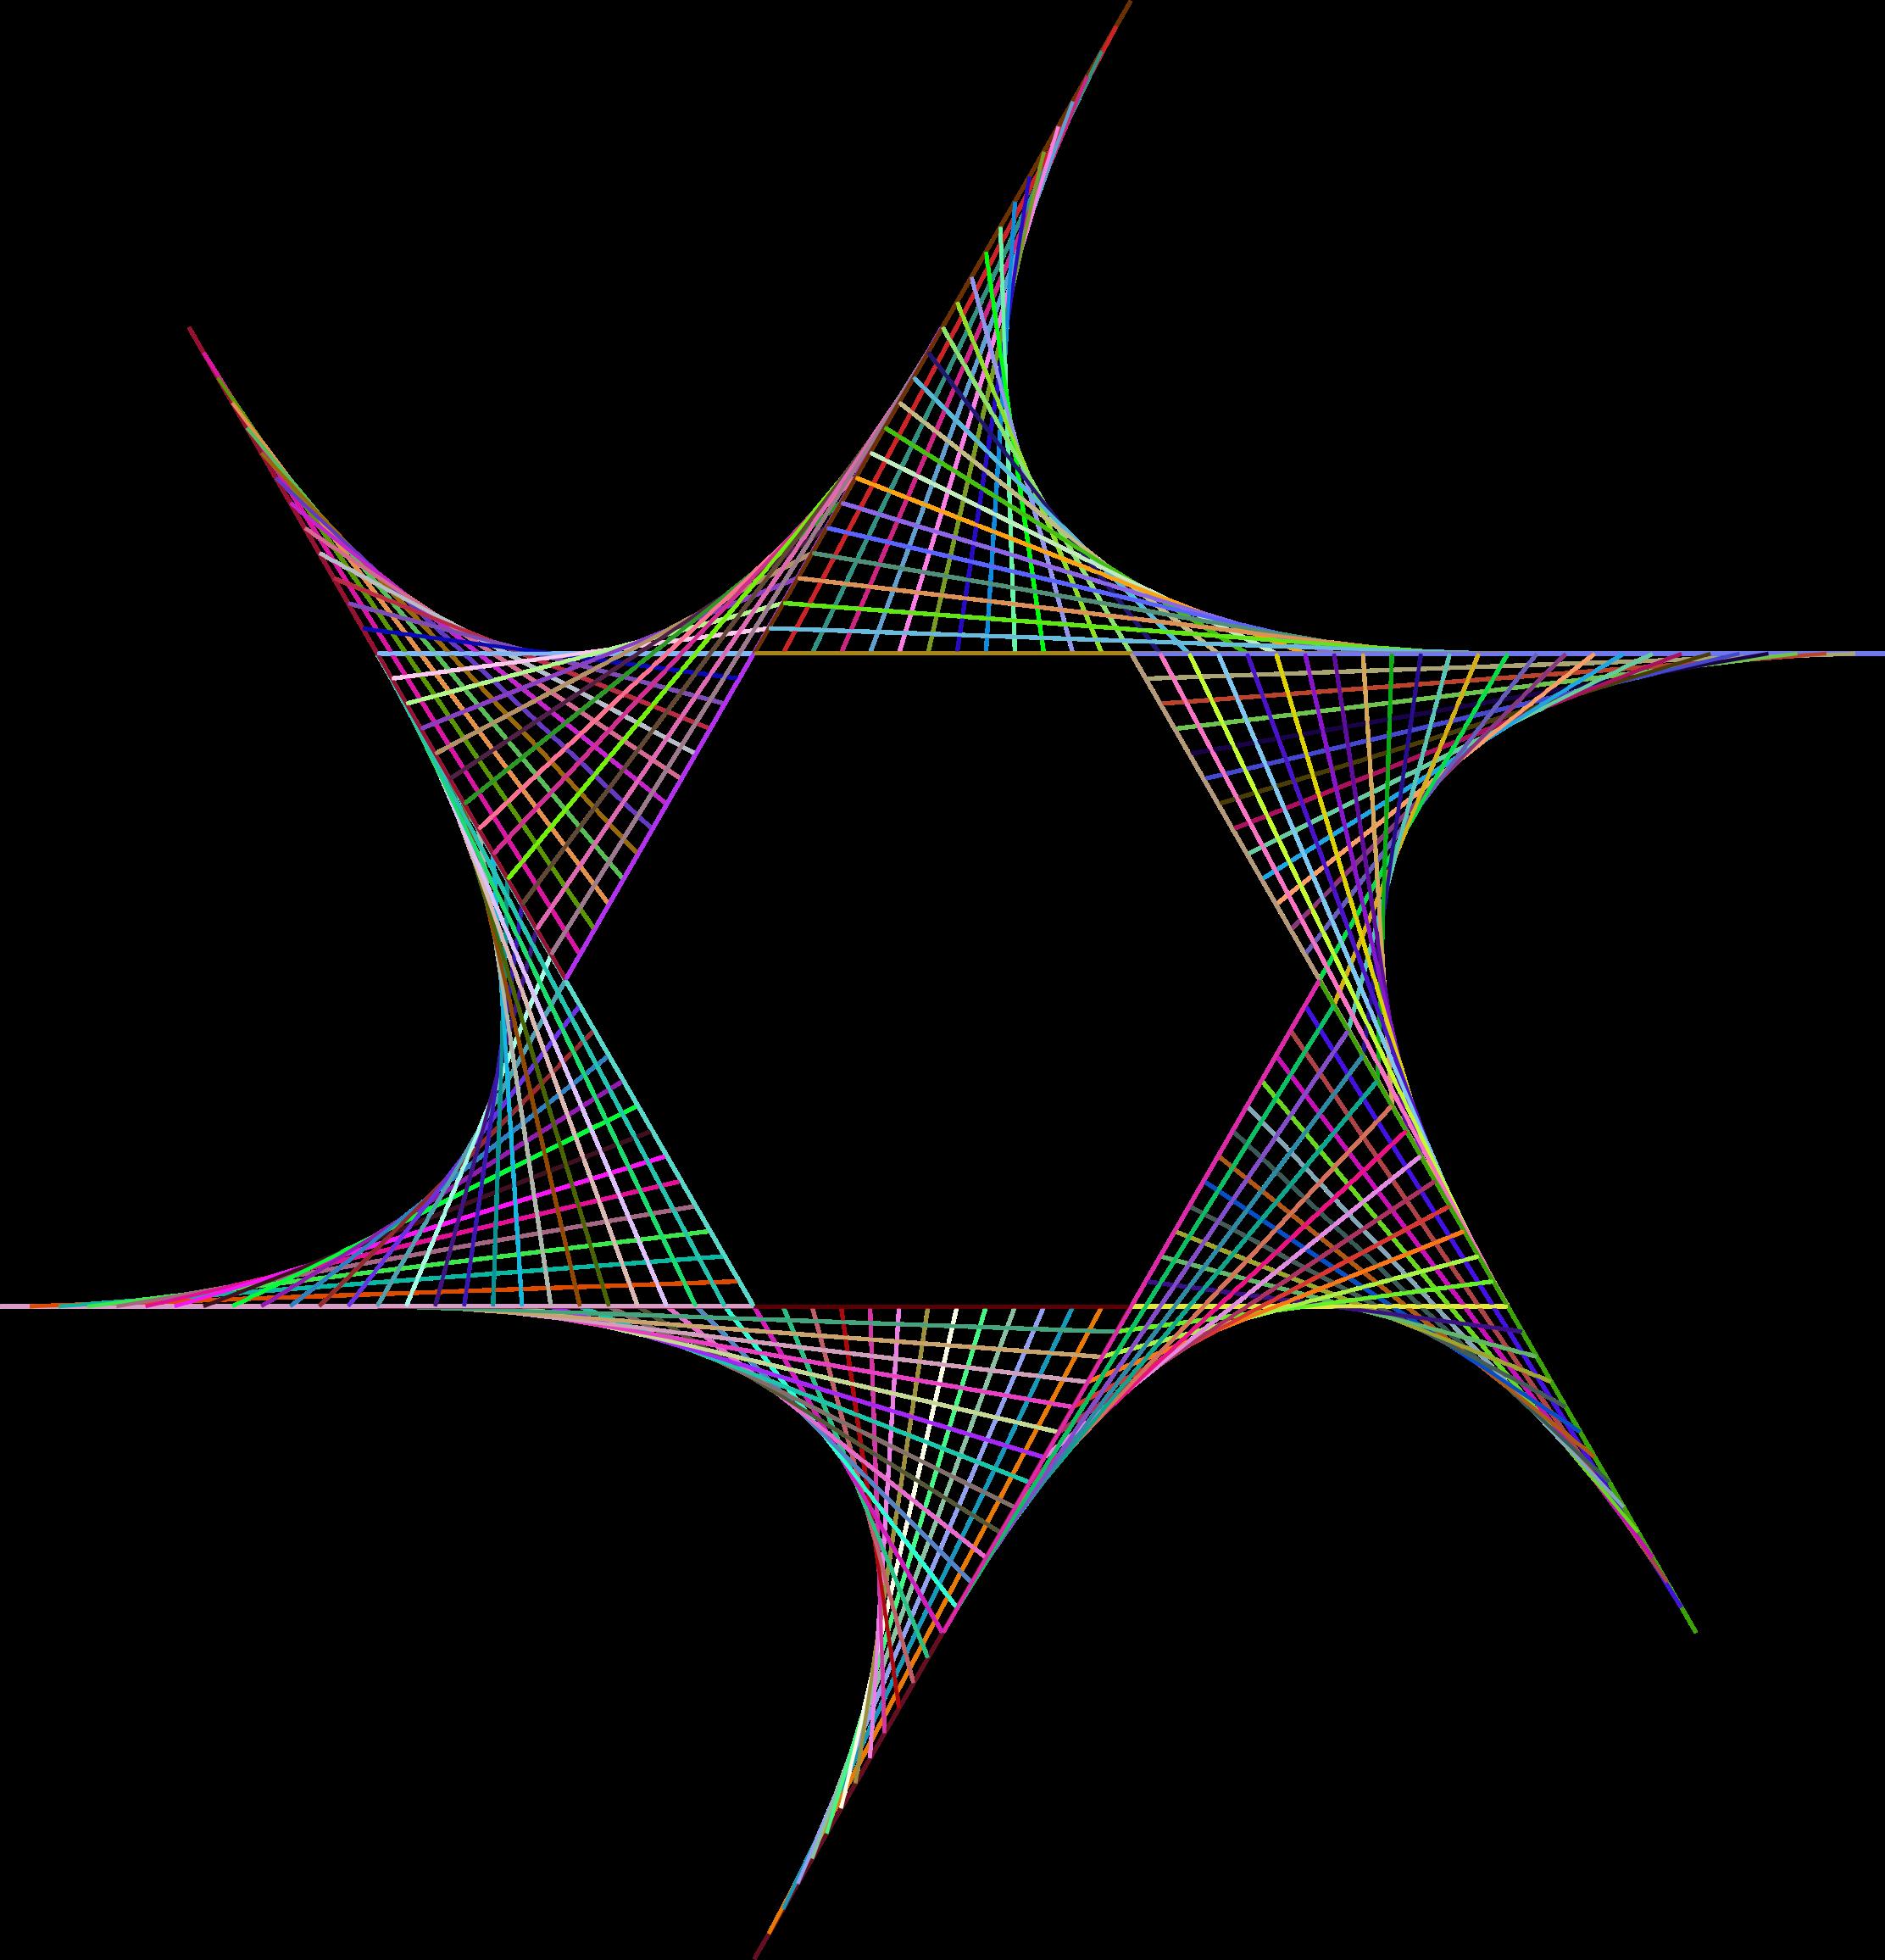 Geometry clipart transparent. Desktop wallpaper clip art